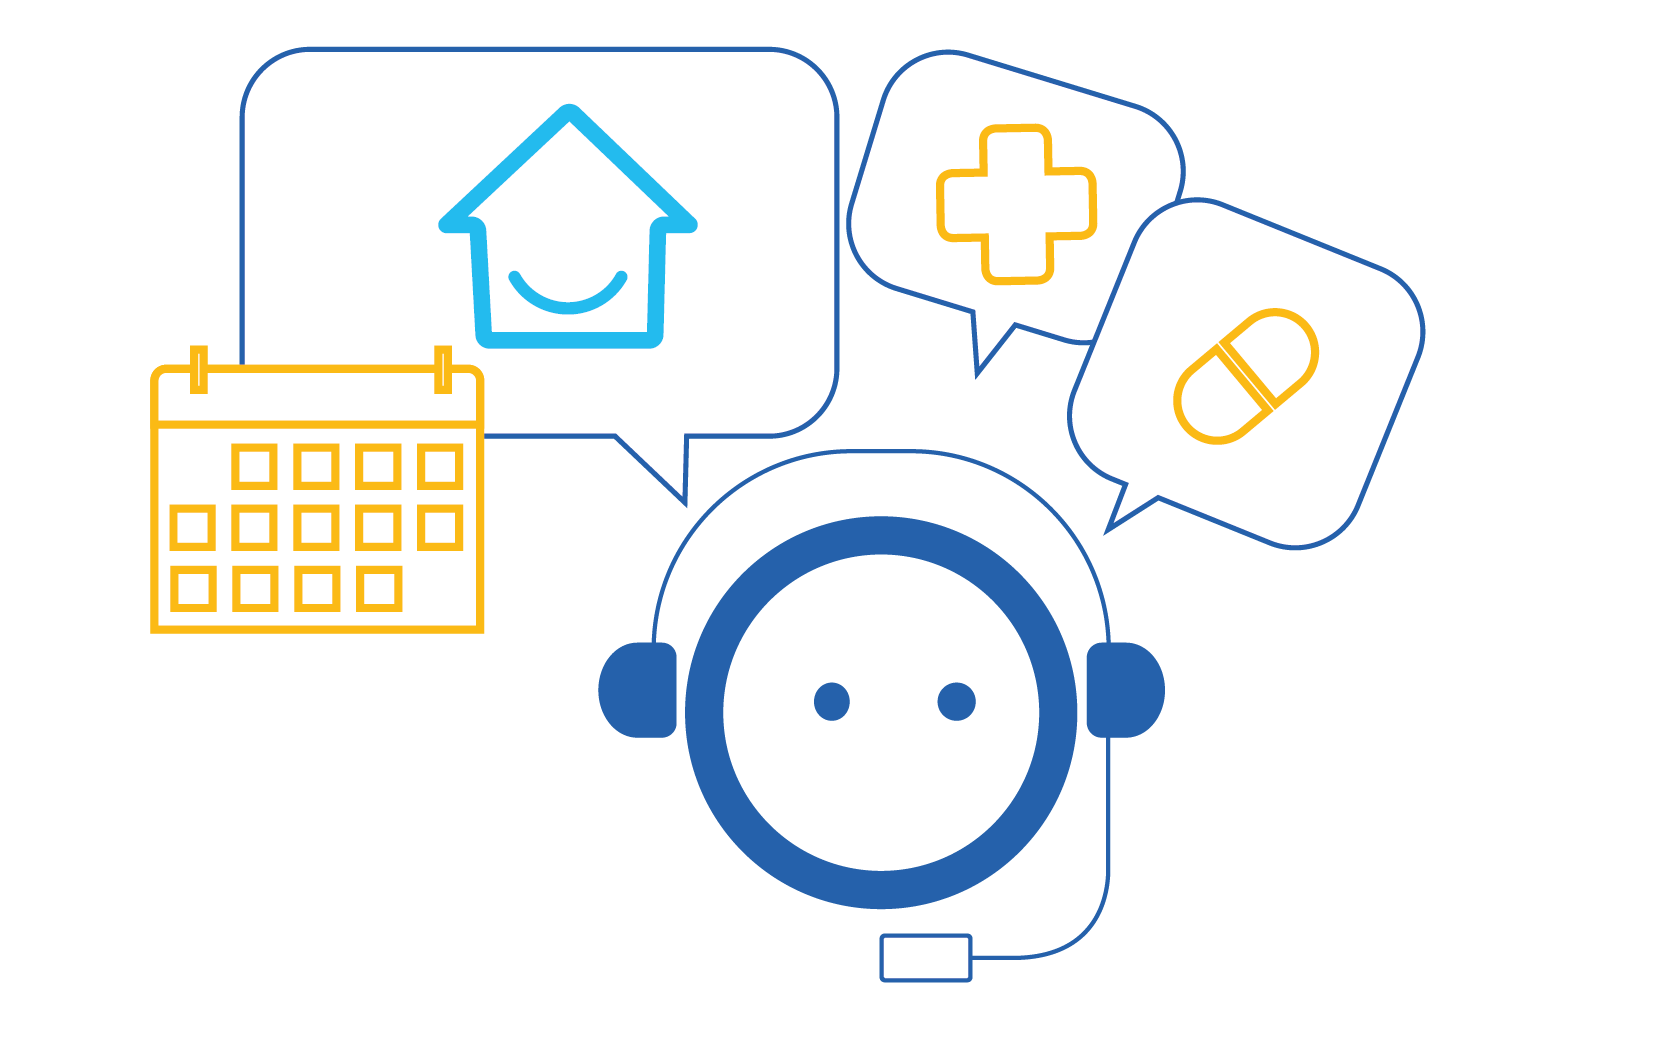 Organisation des soins coordinateur libheros